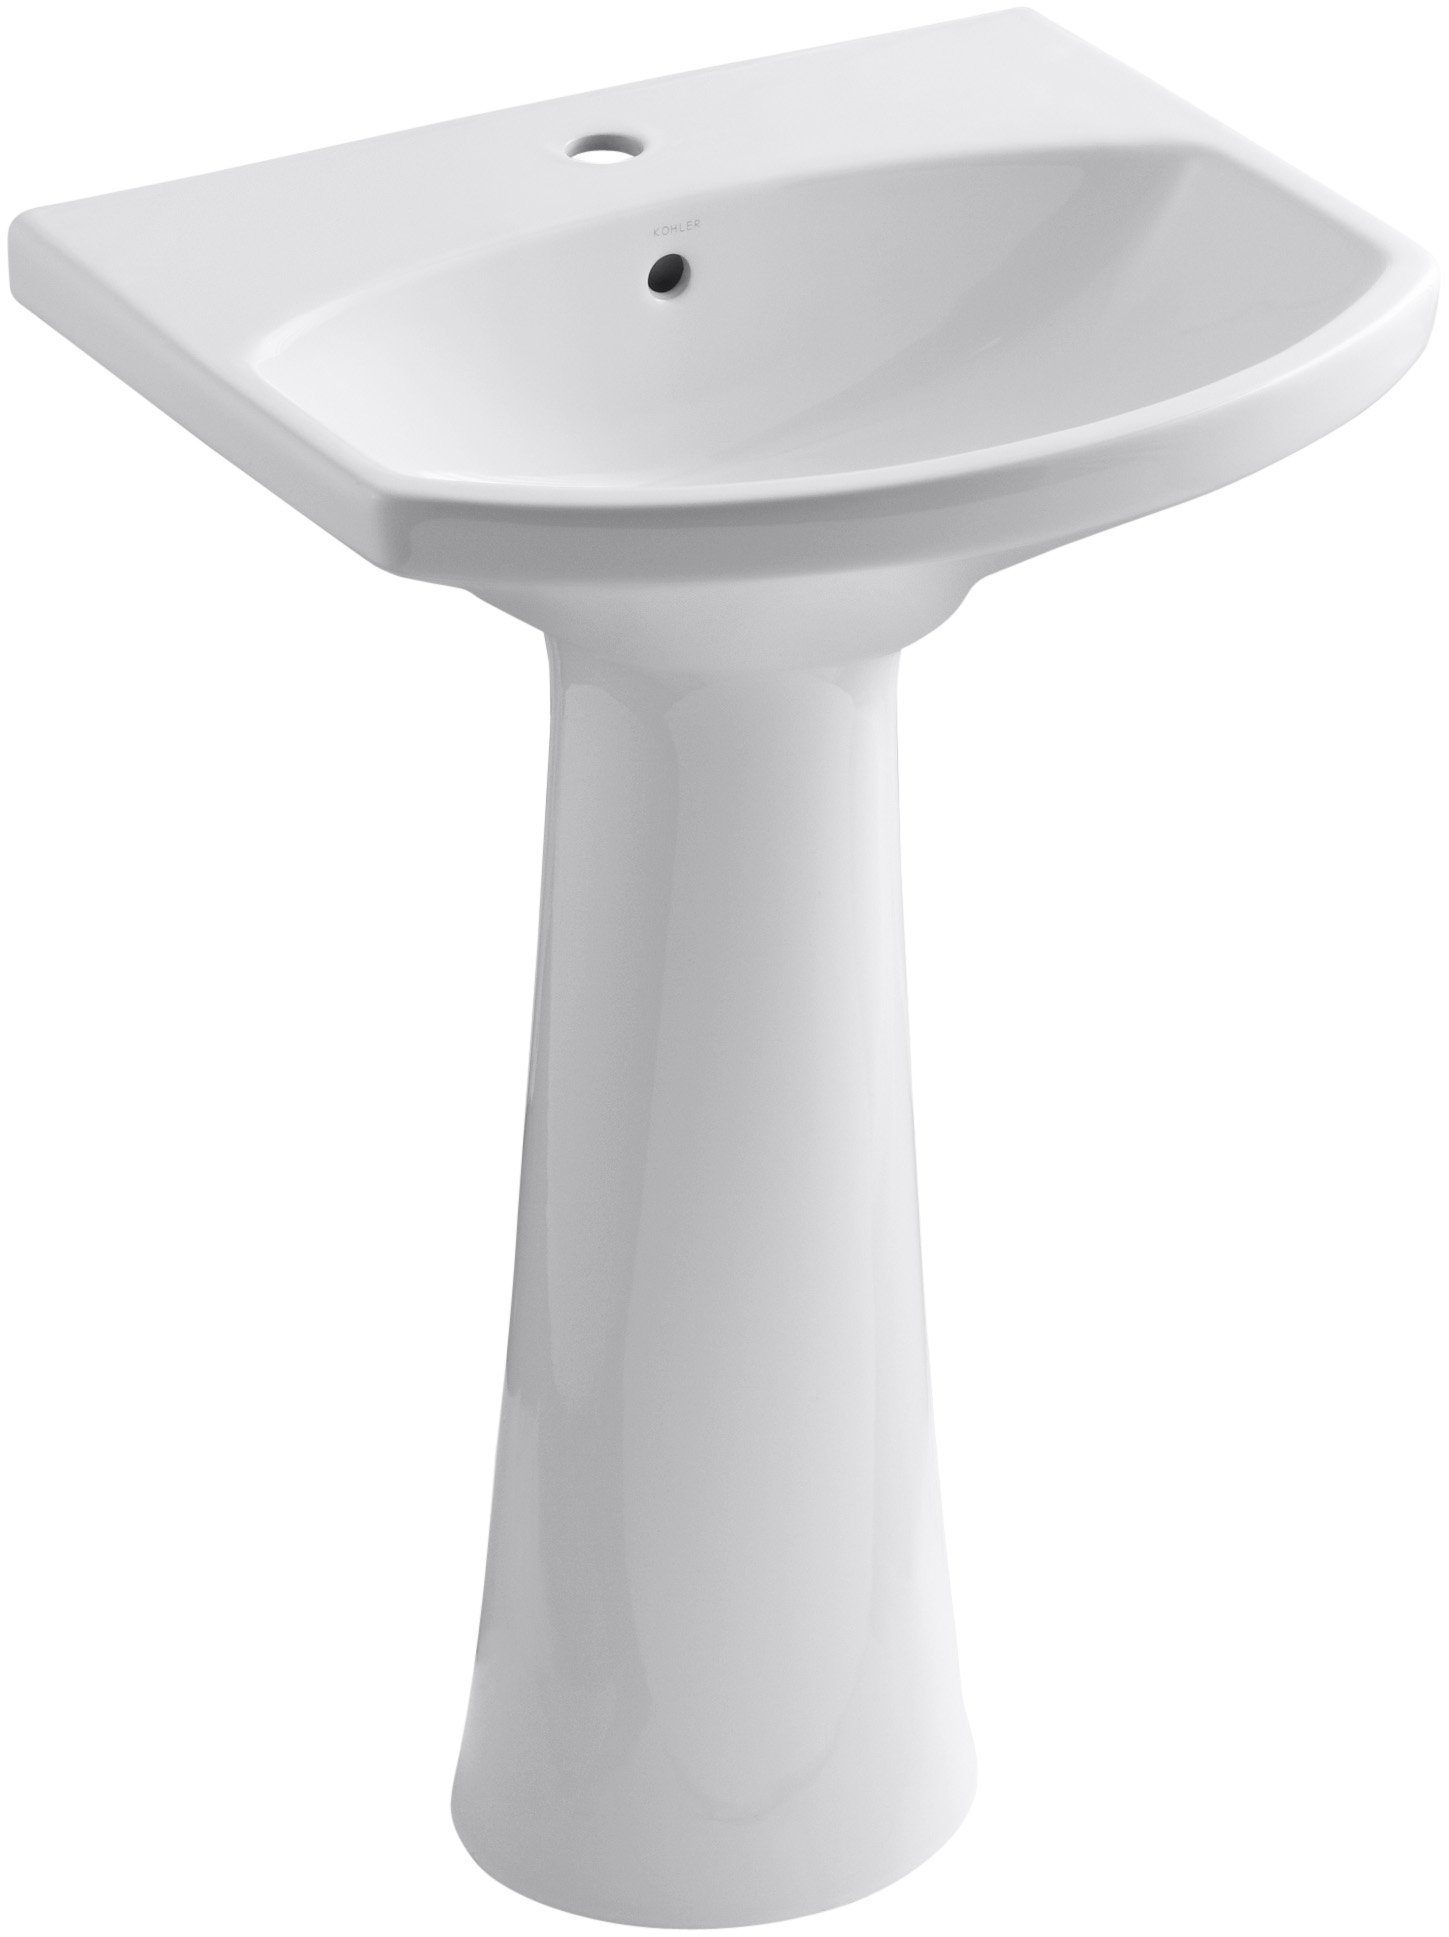 KOHLER K 2362 1 0 Cimarron Pedestal Bathroom Sink With Single Hole Faucet  Drilling, White